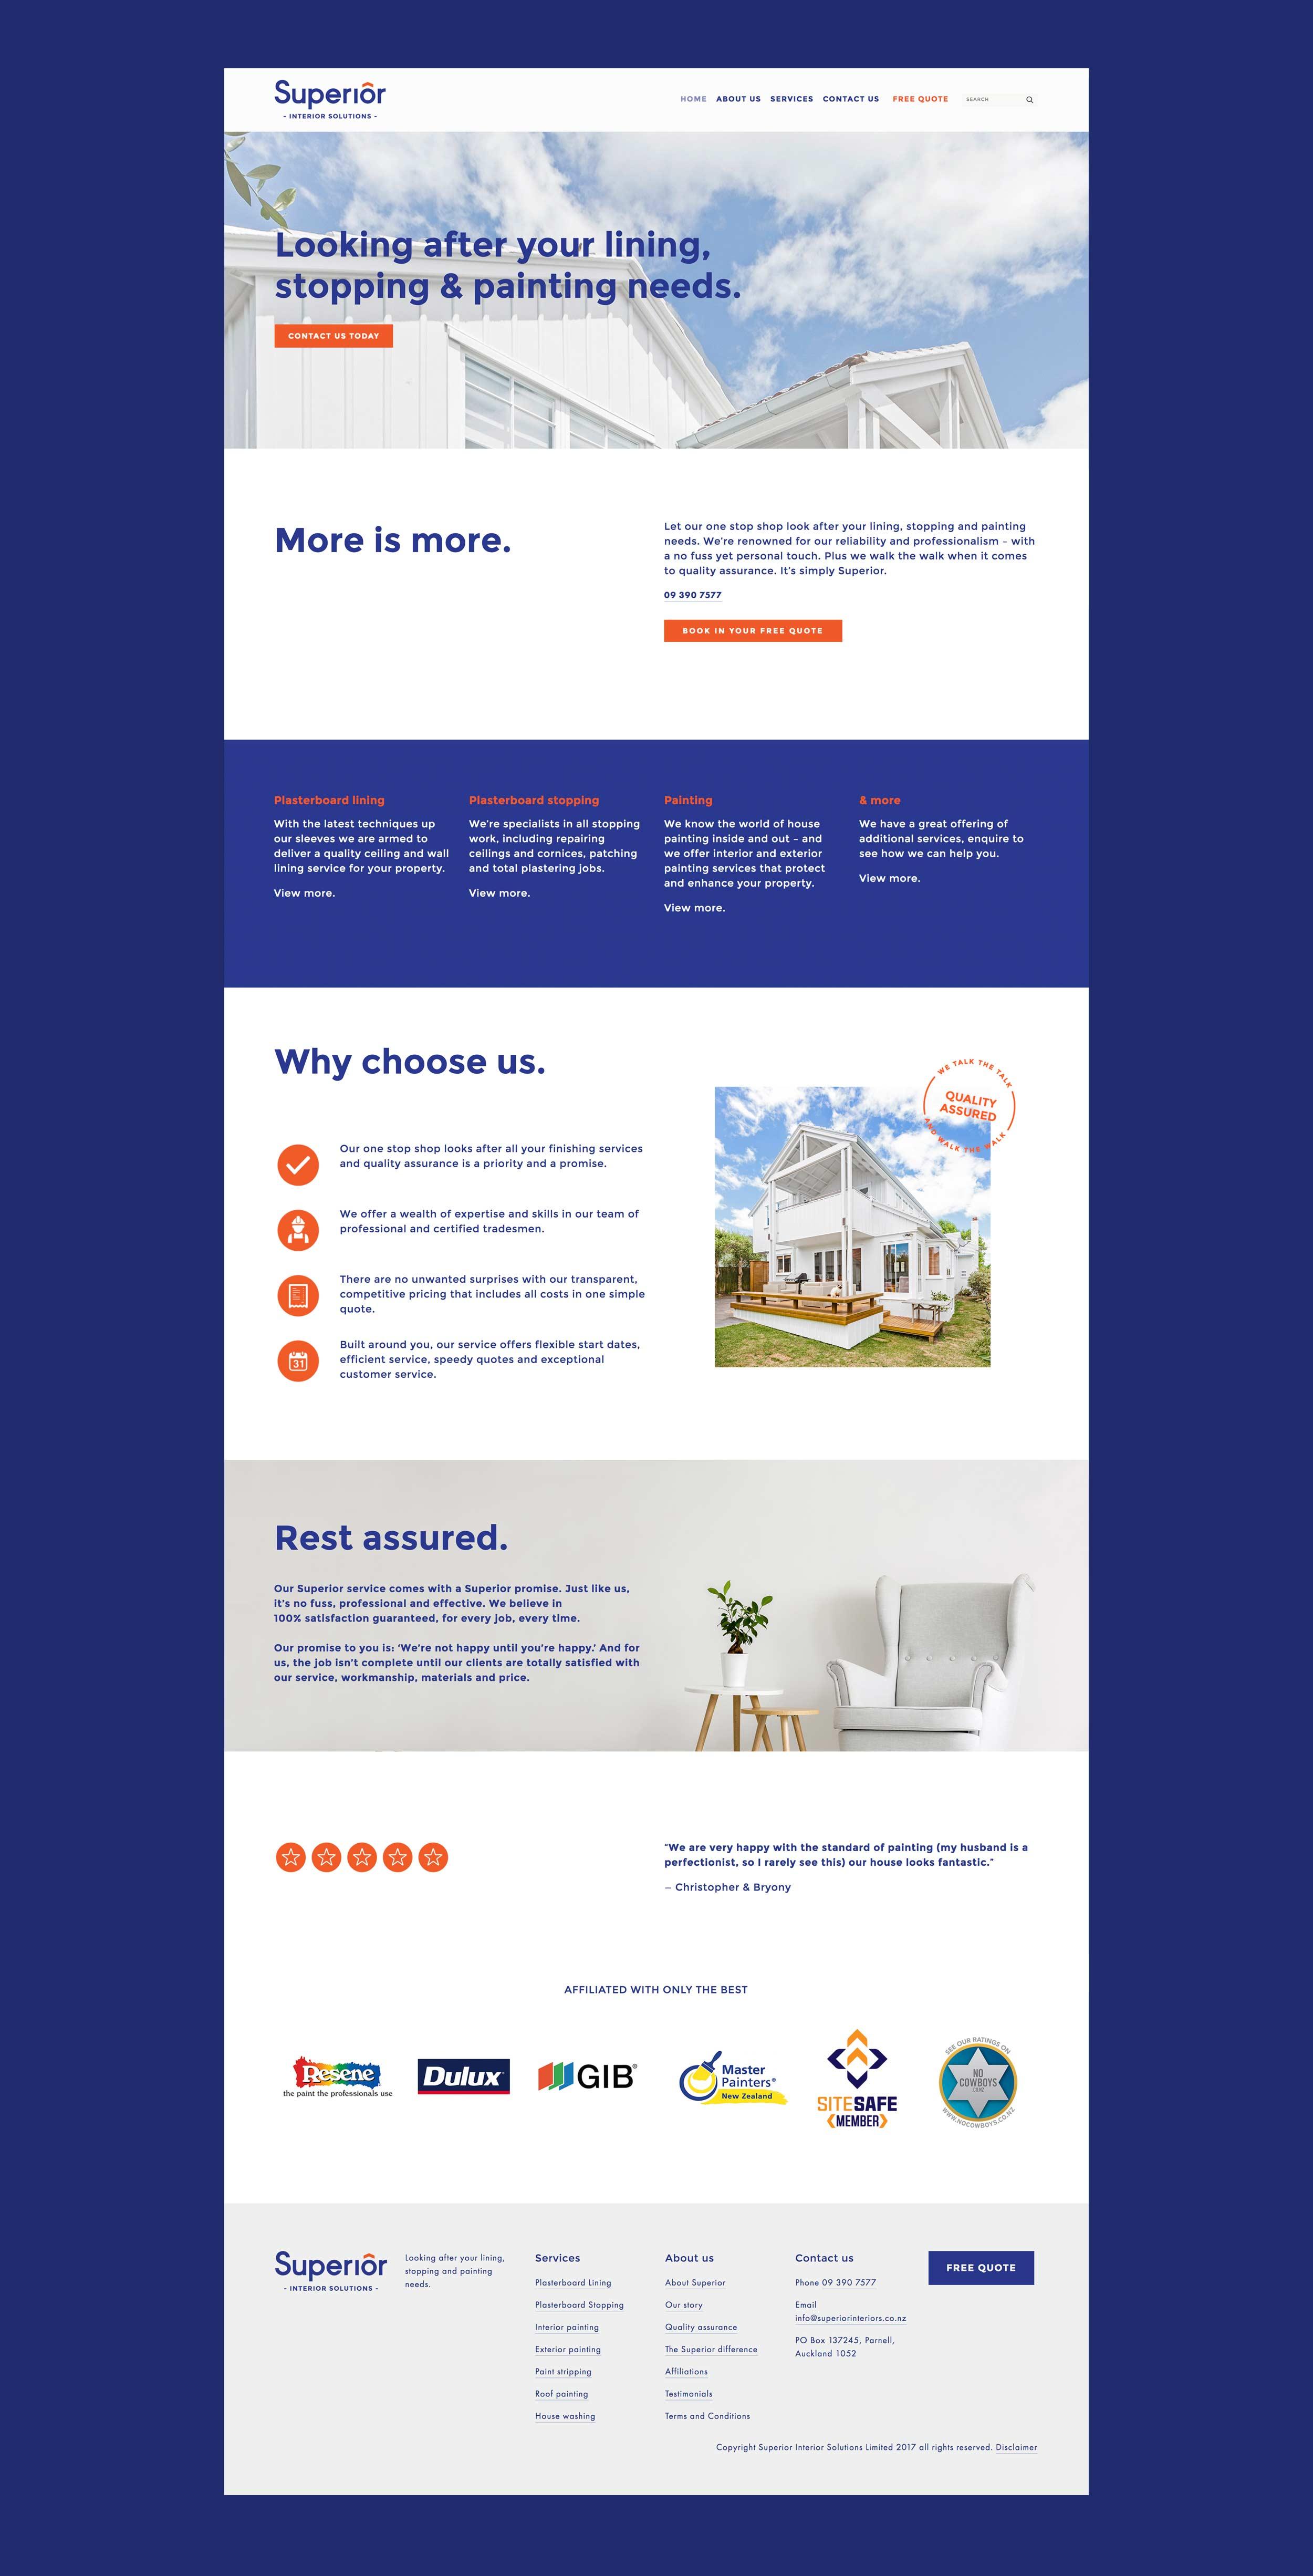 DetailStudio-SuperiorInteriors-WebsiteB.jpg